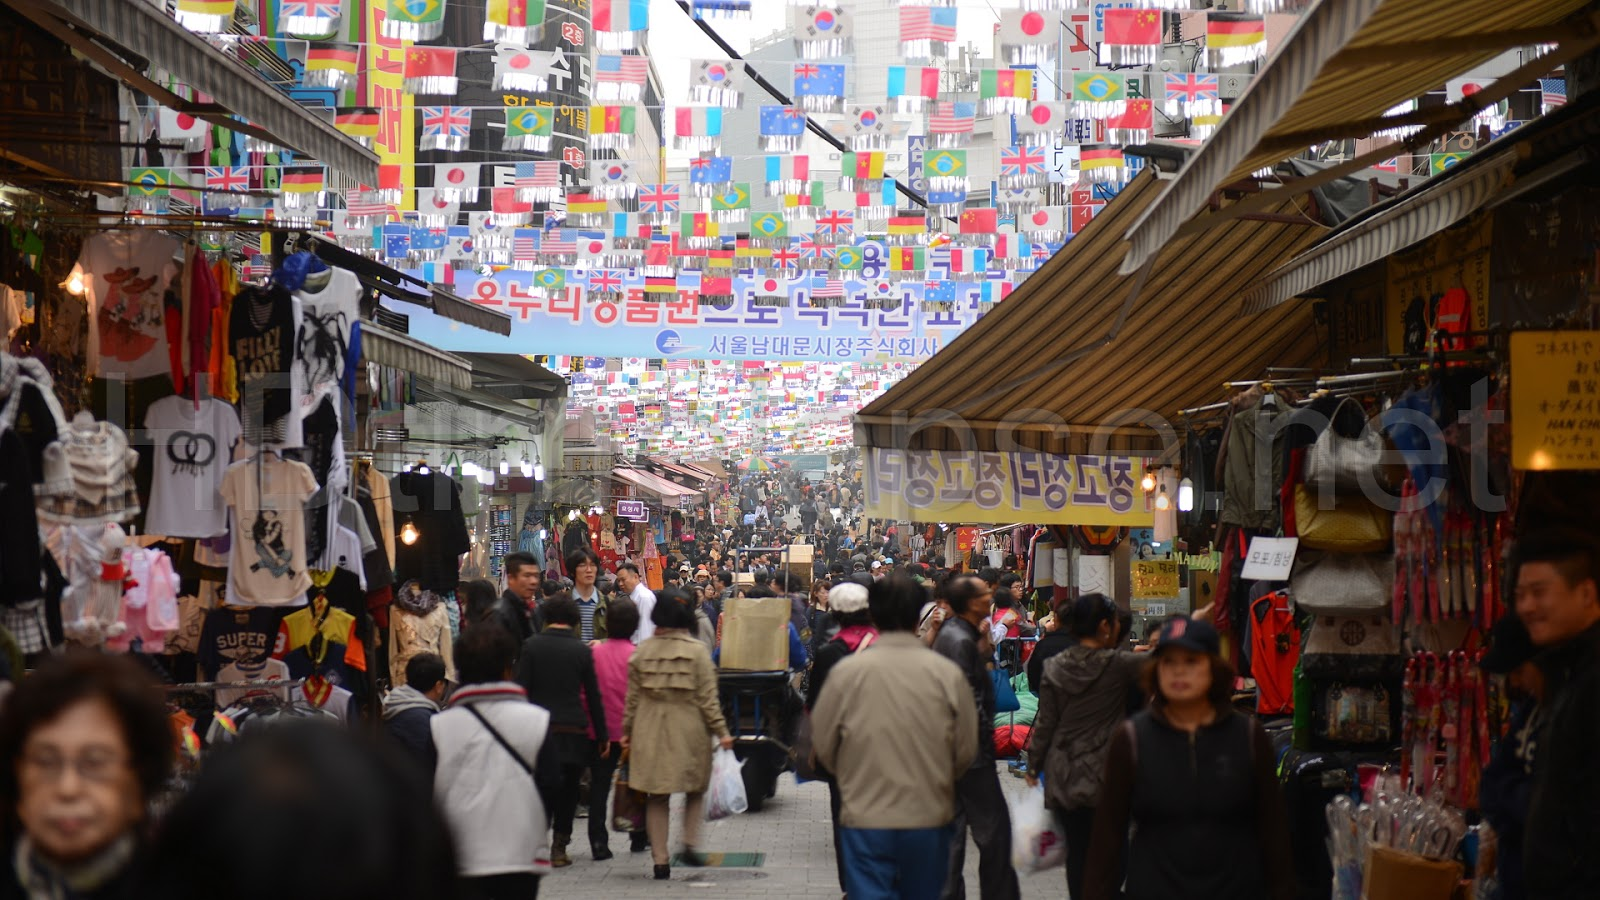 mua sắm tại Dongdaemum